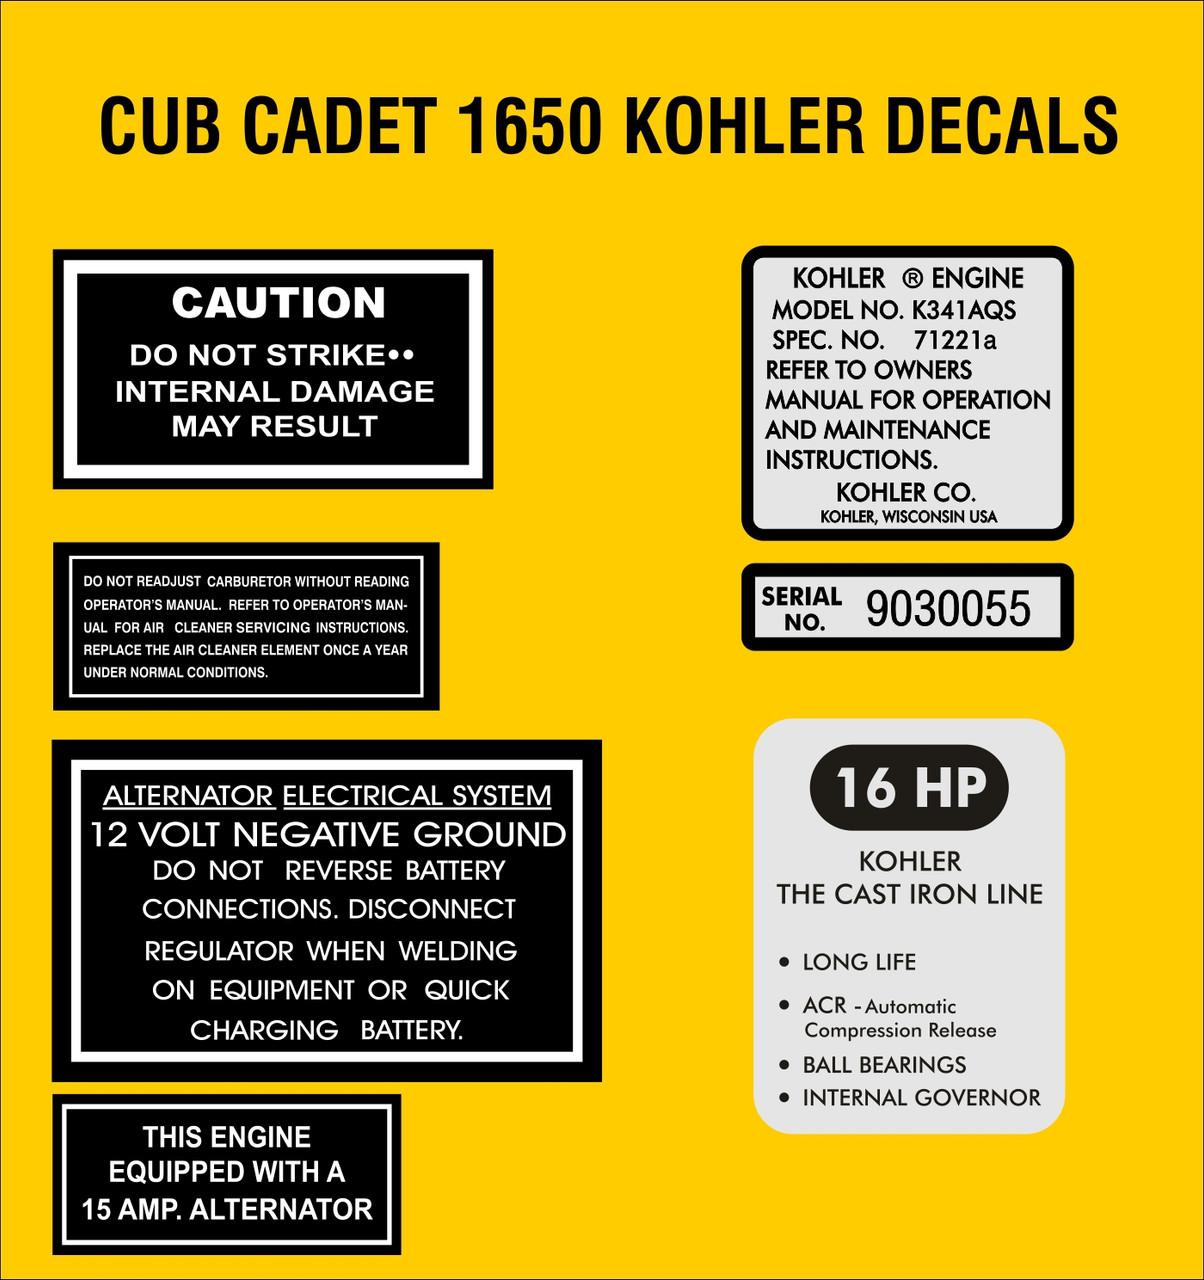 CUB CADET KOHLER K341AQS ENGINE REPRODUCTION DECAL SET